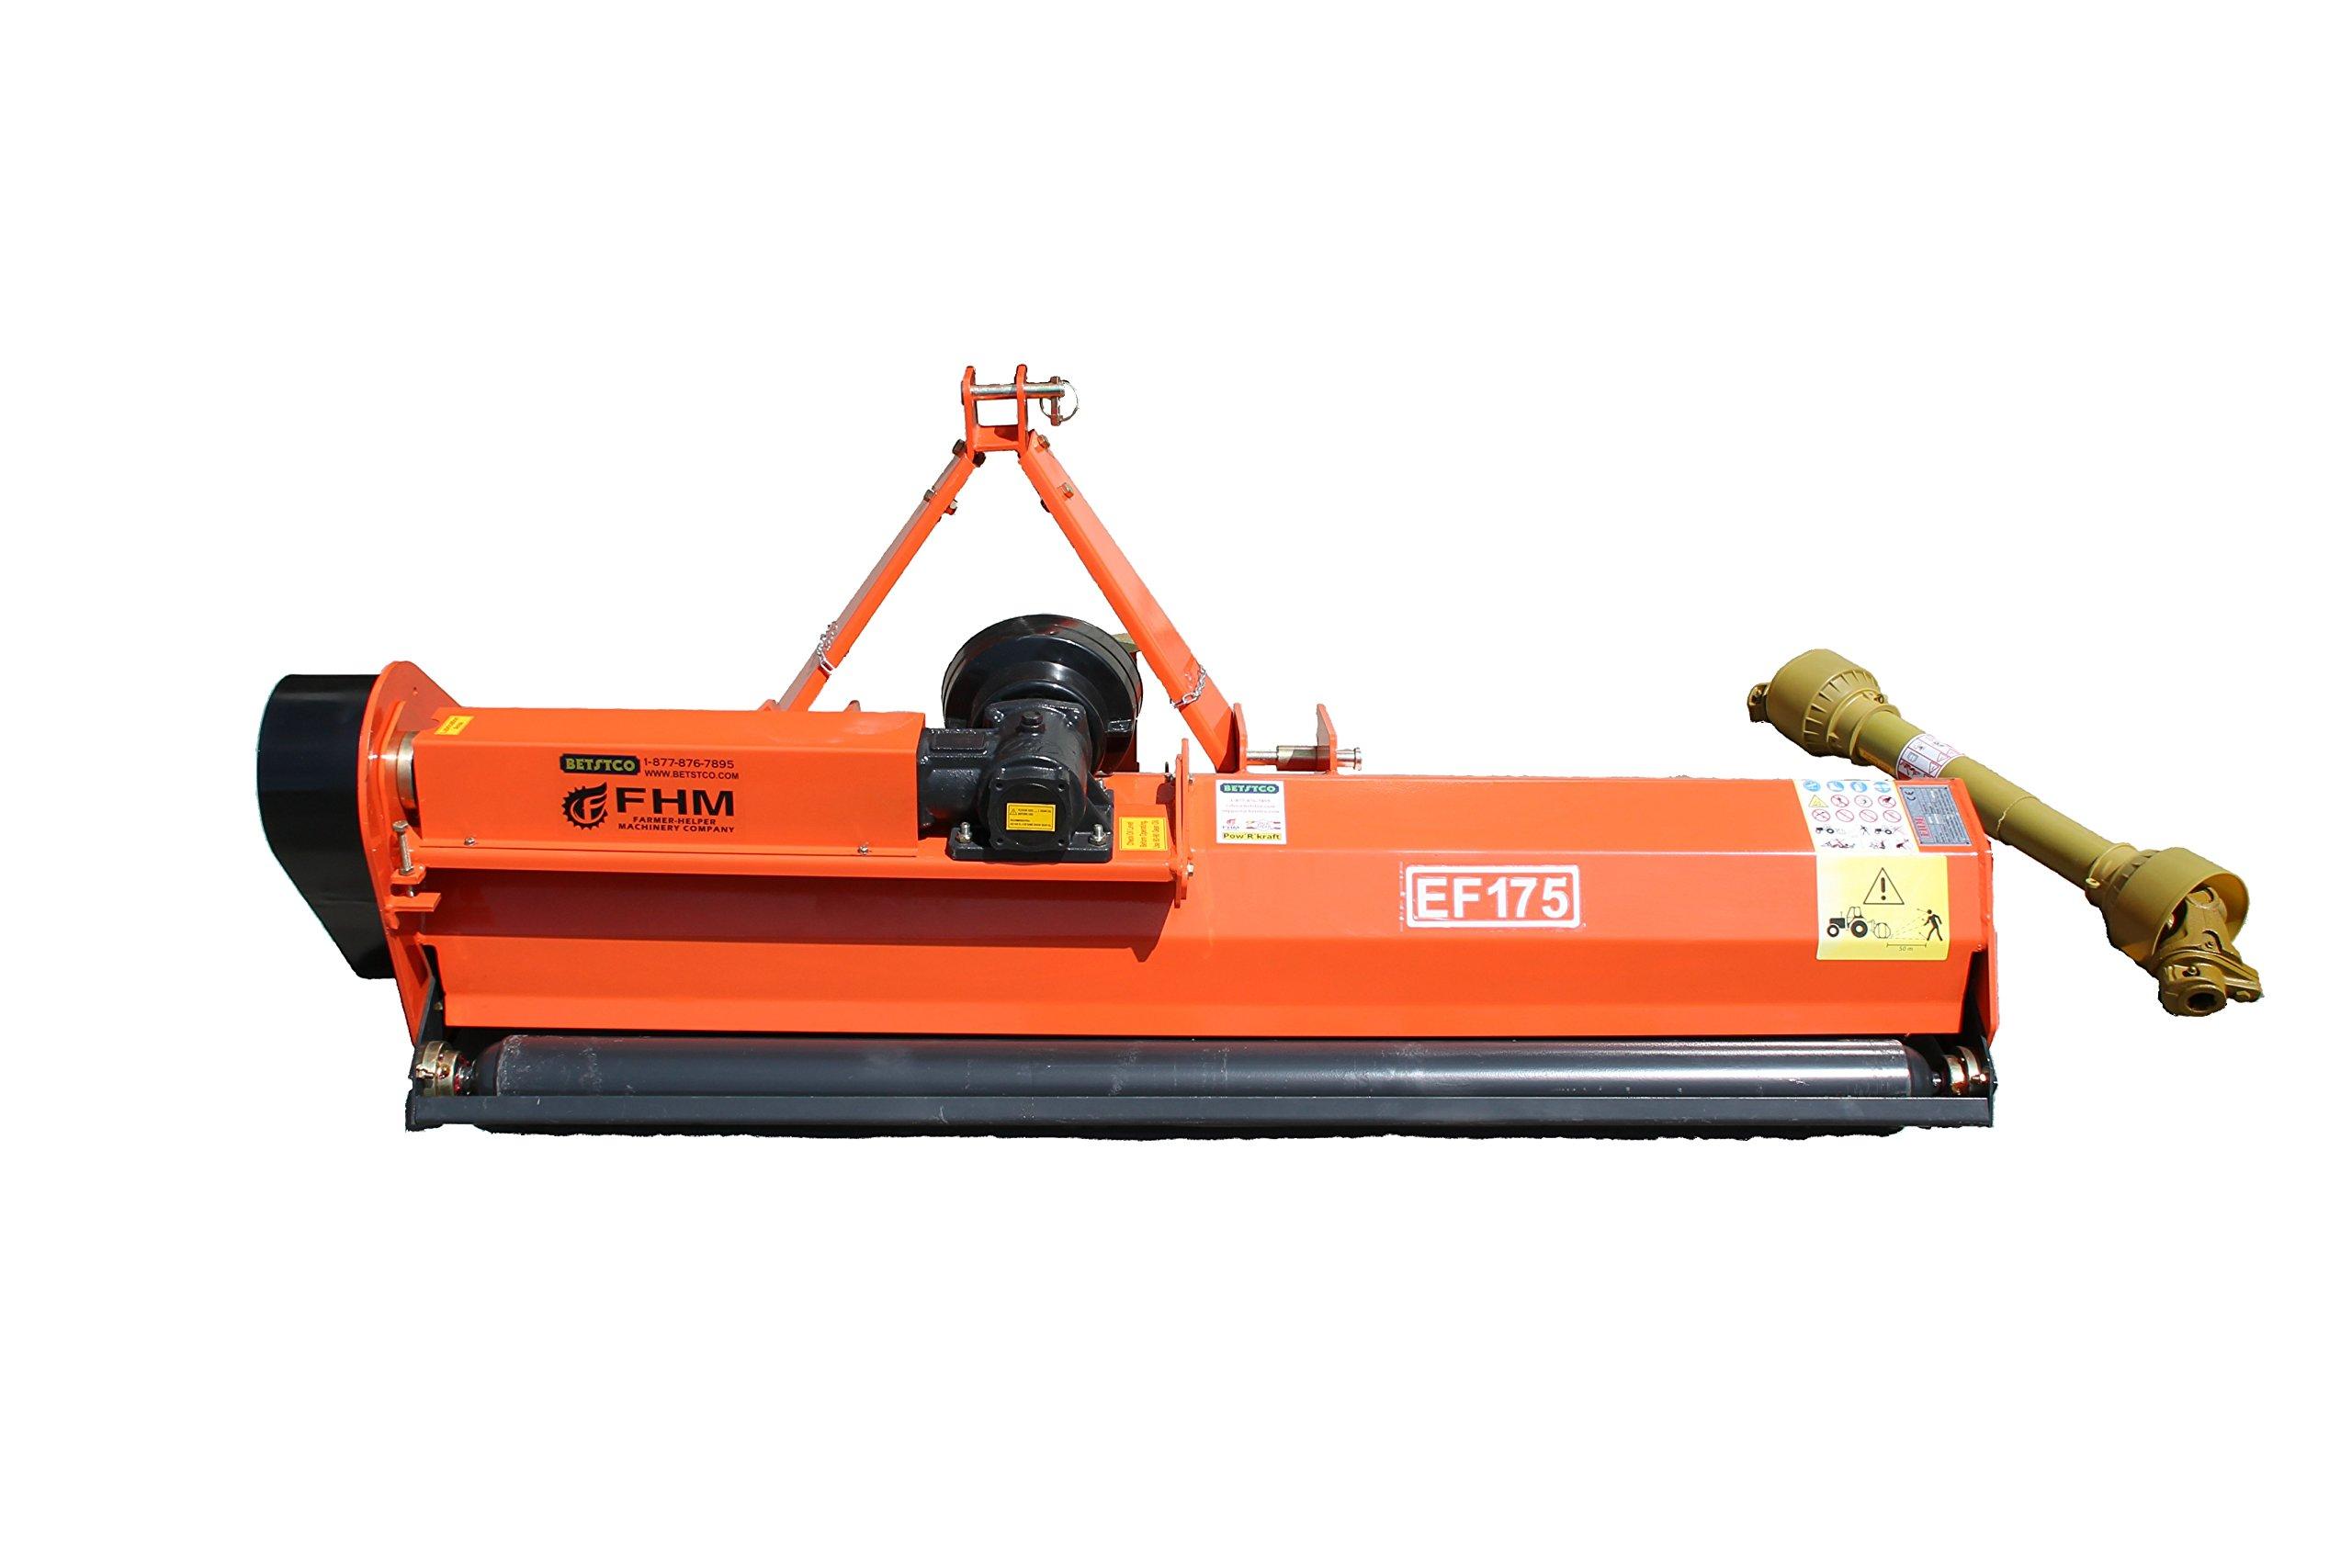 Farmer Helper 60'' Field Flail Mower Cat.I 3pt 28HP+ Rating (FH-EF175)